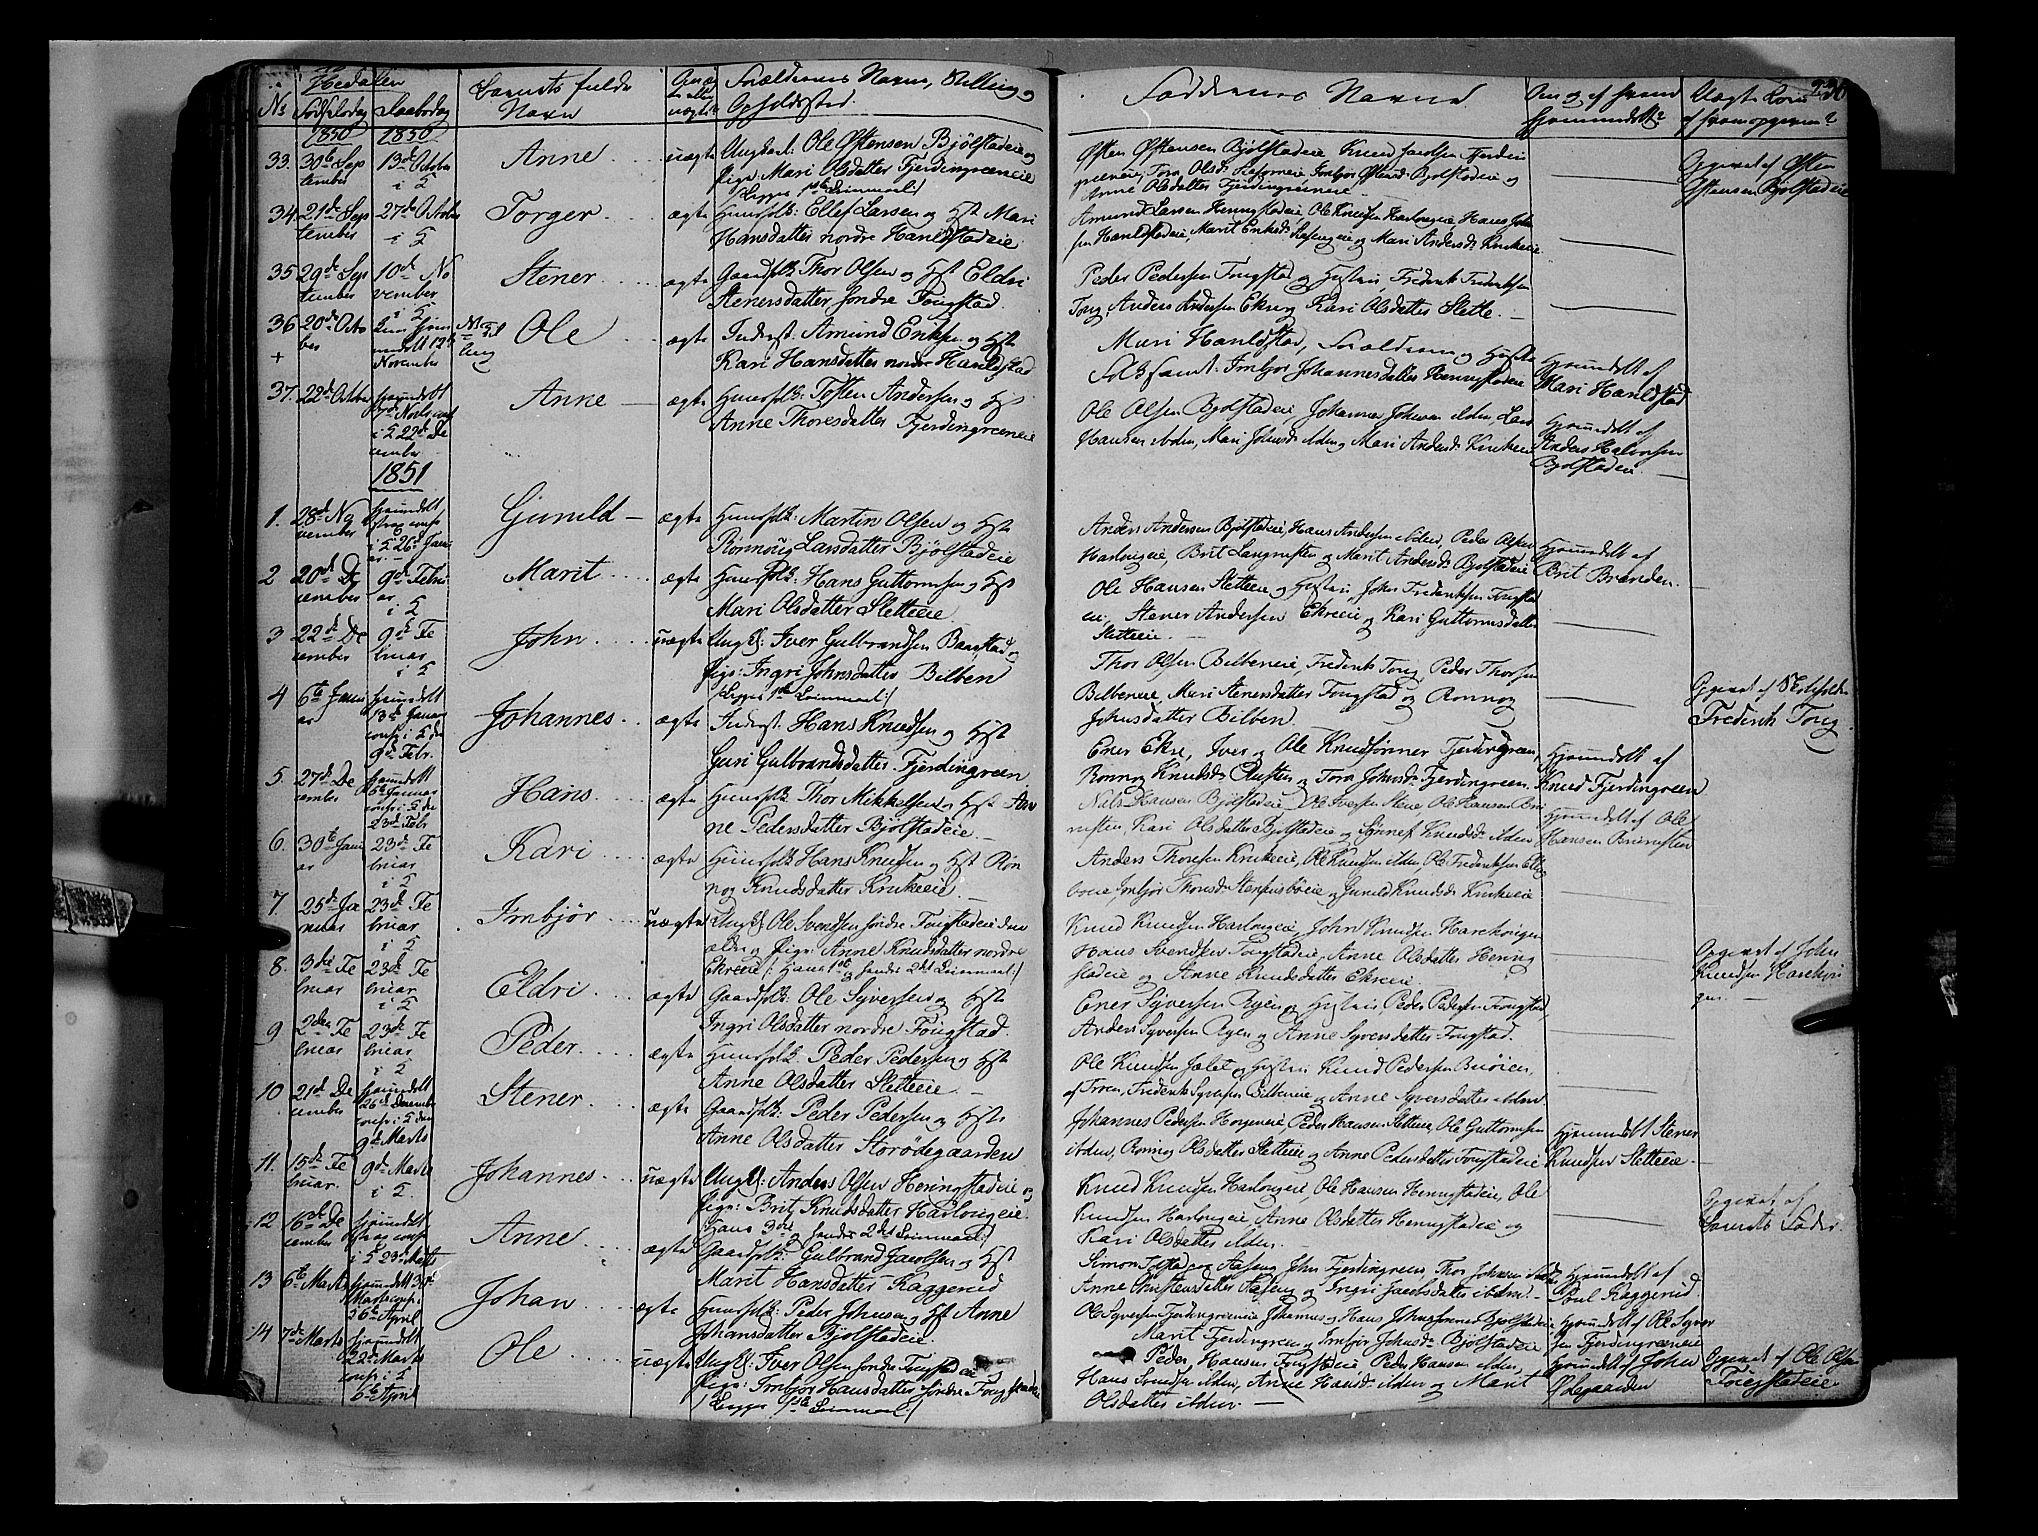 SAH, Vågå prestekontor, Ministerialbok nr. 5 /2, 1842-1856, s. 236